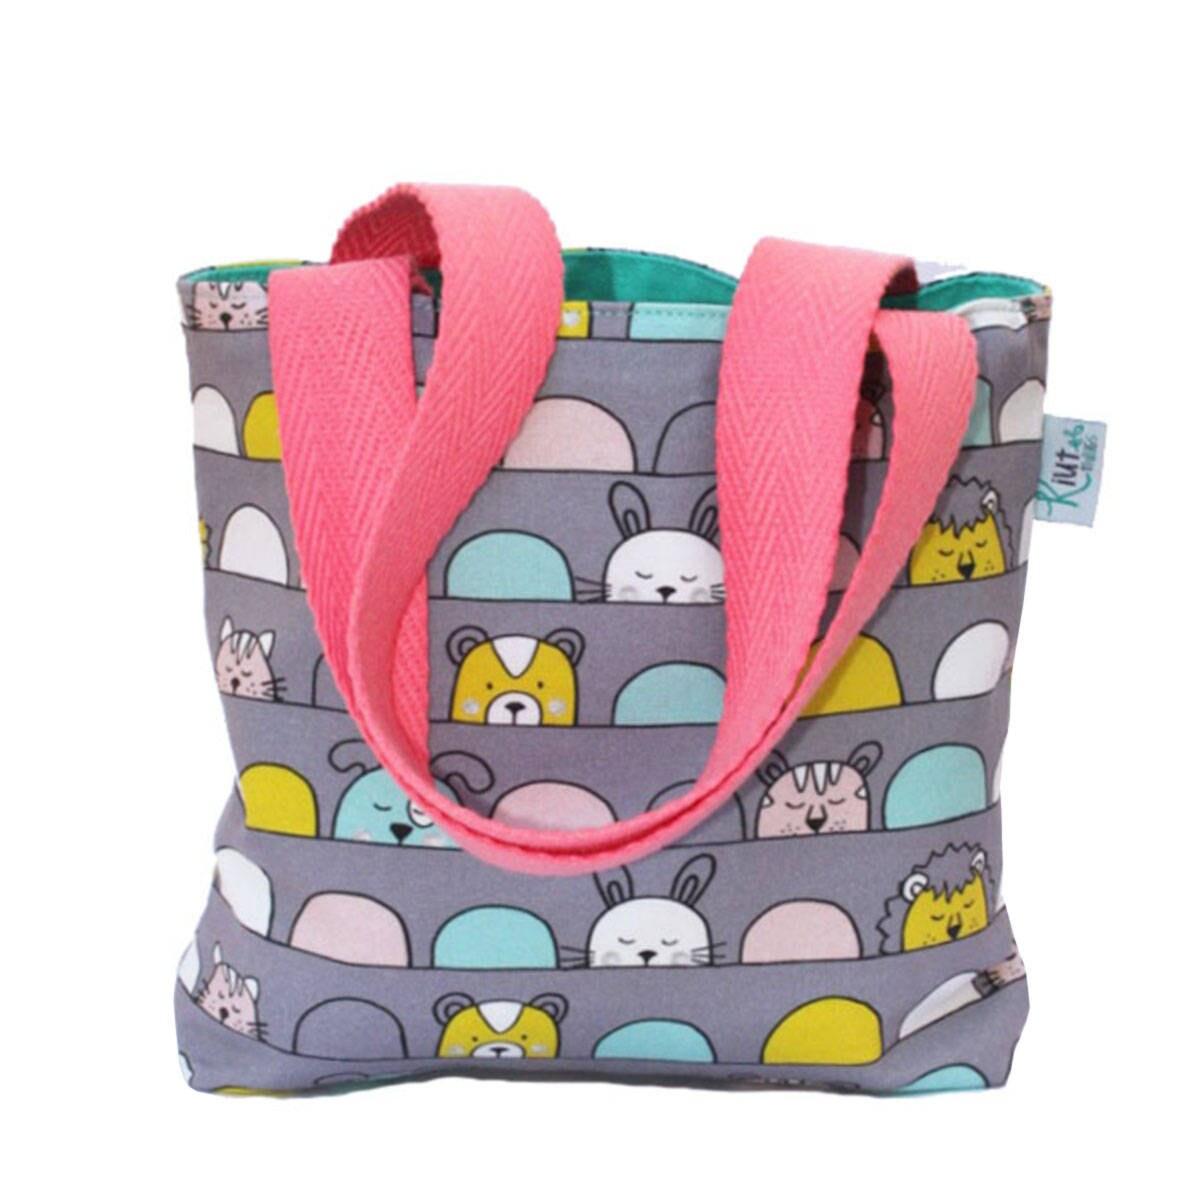 Animals children tote bag, Kids tote bag, Animals kids tote bag ...